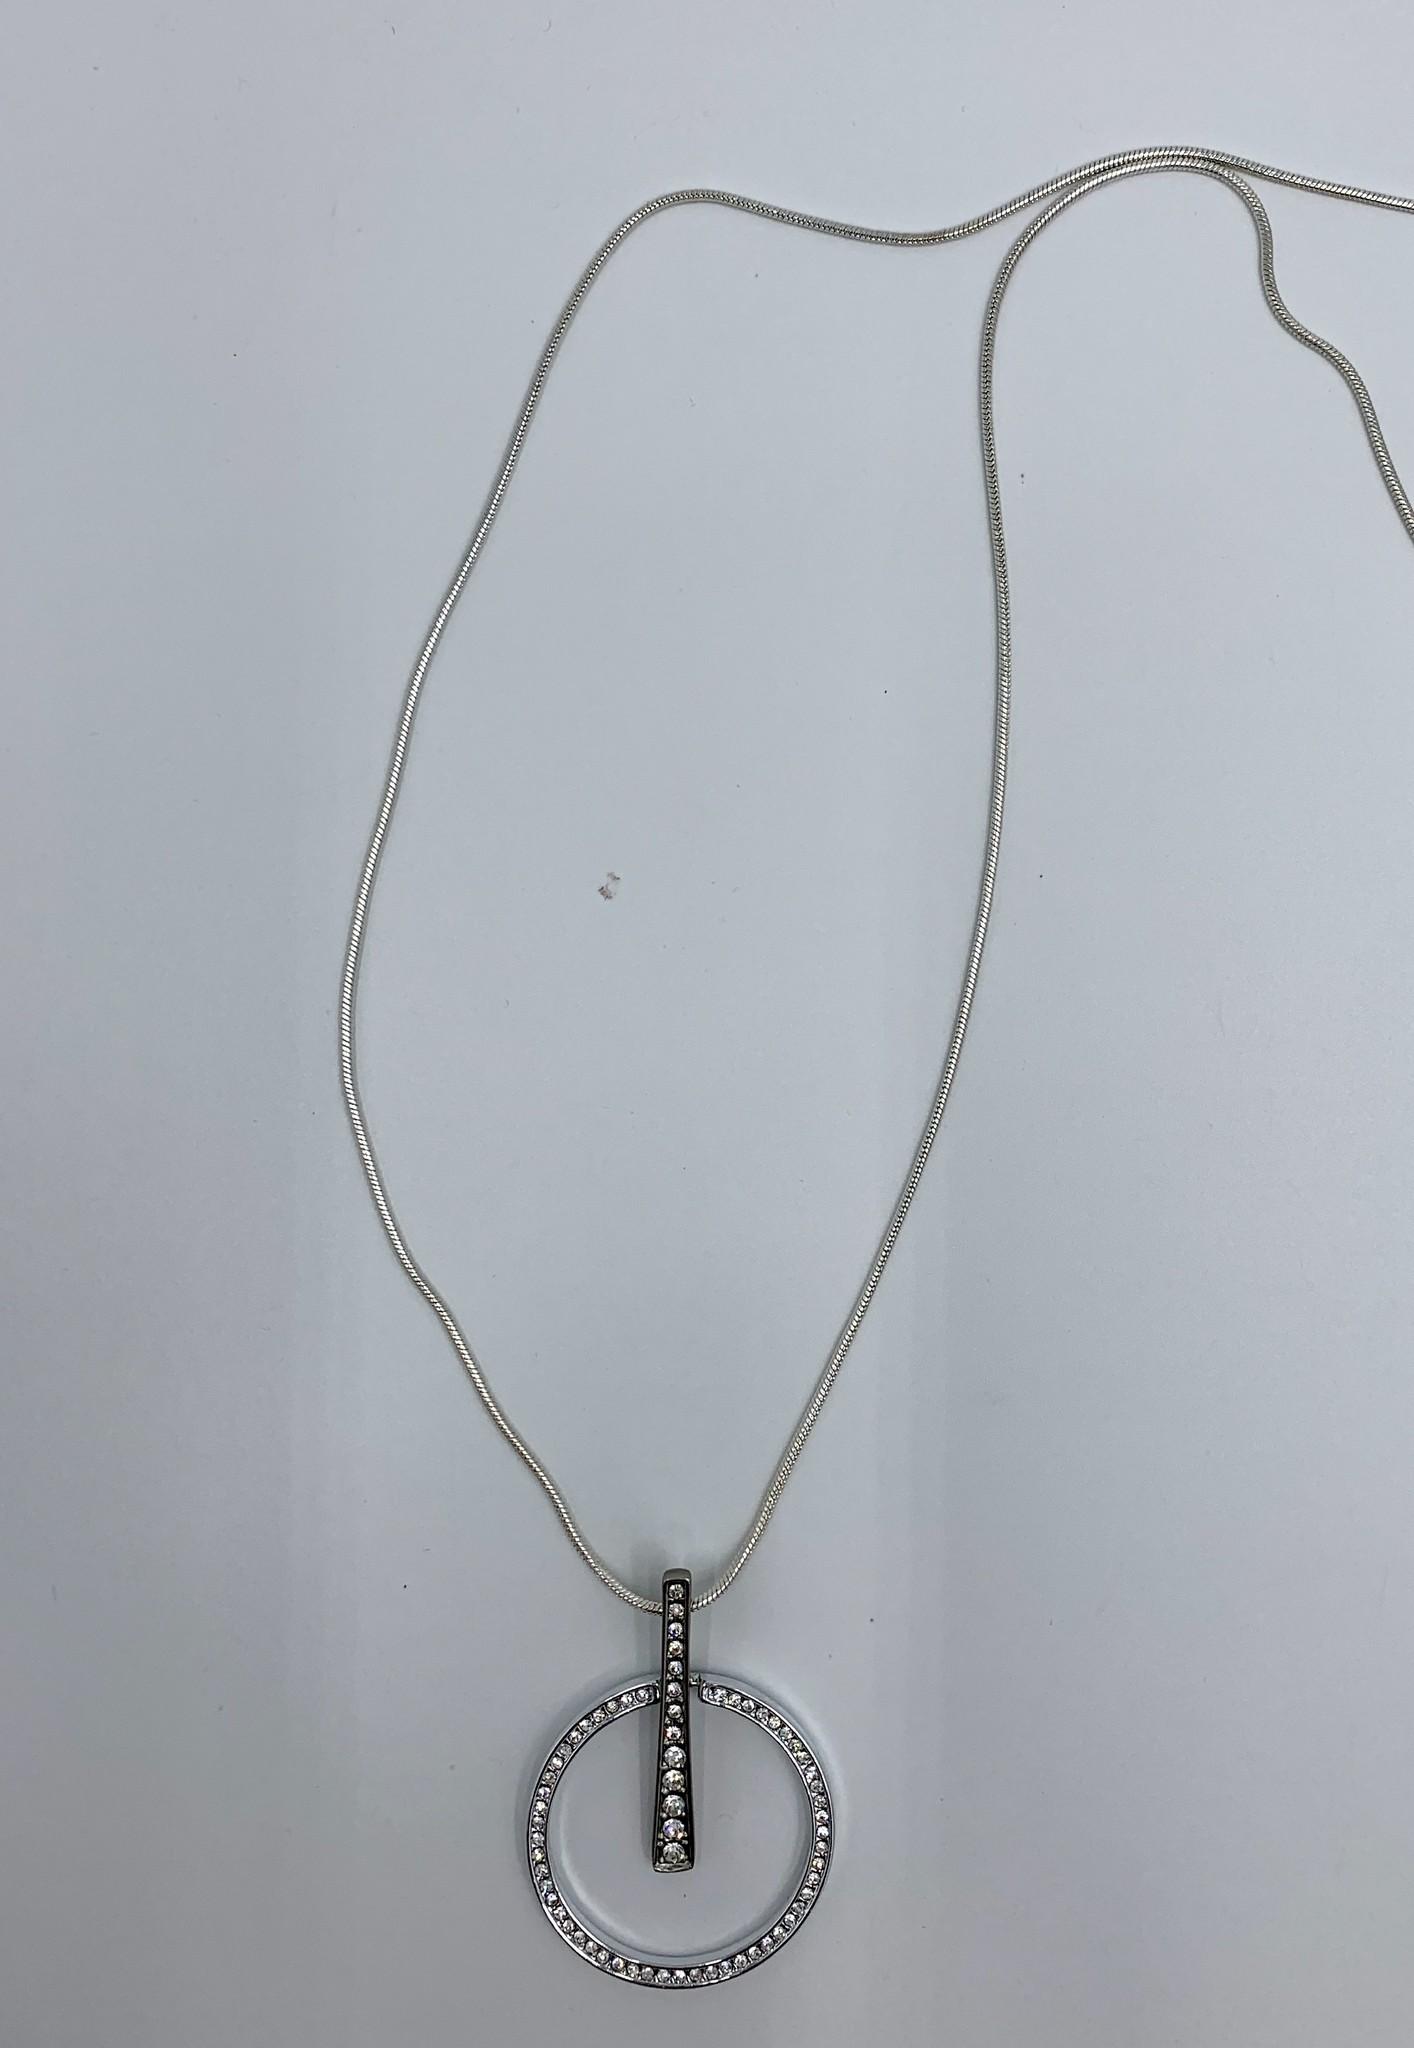 Robert A Rhinestone Necklace